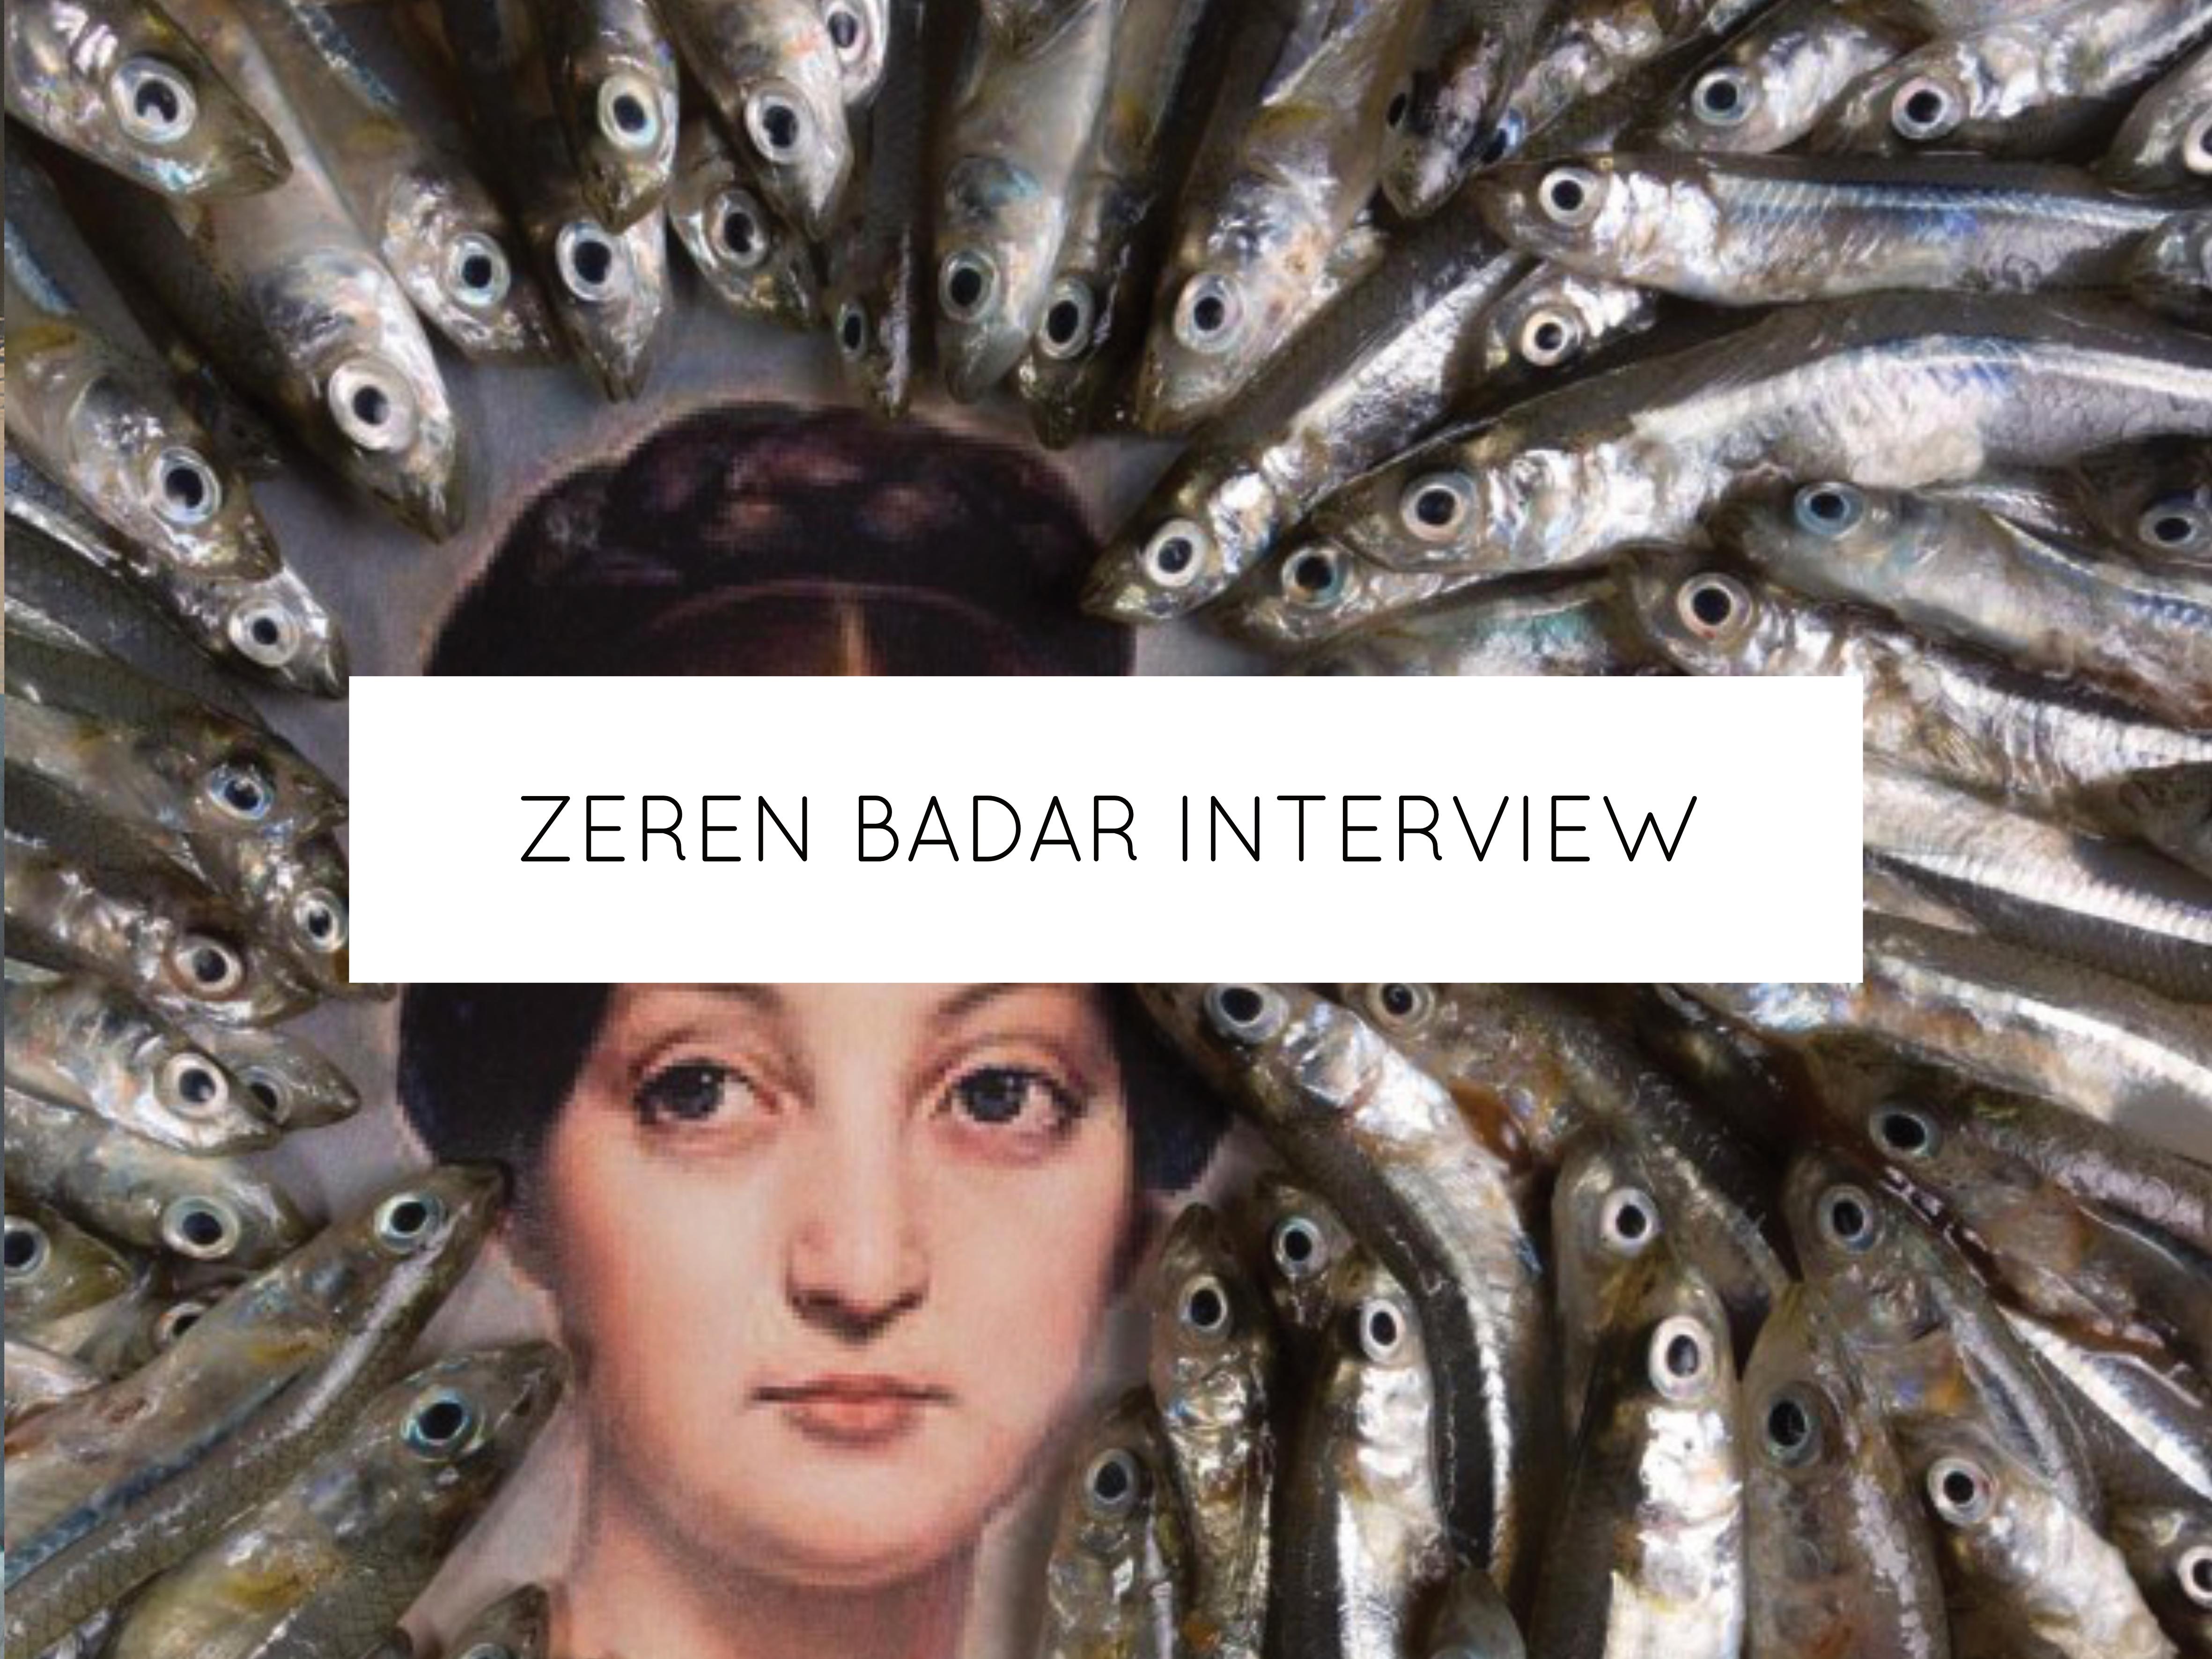 zeren badar interview